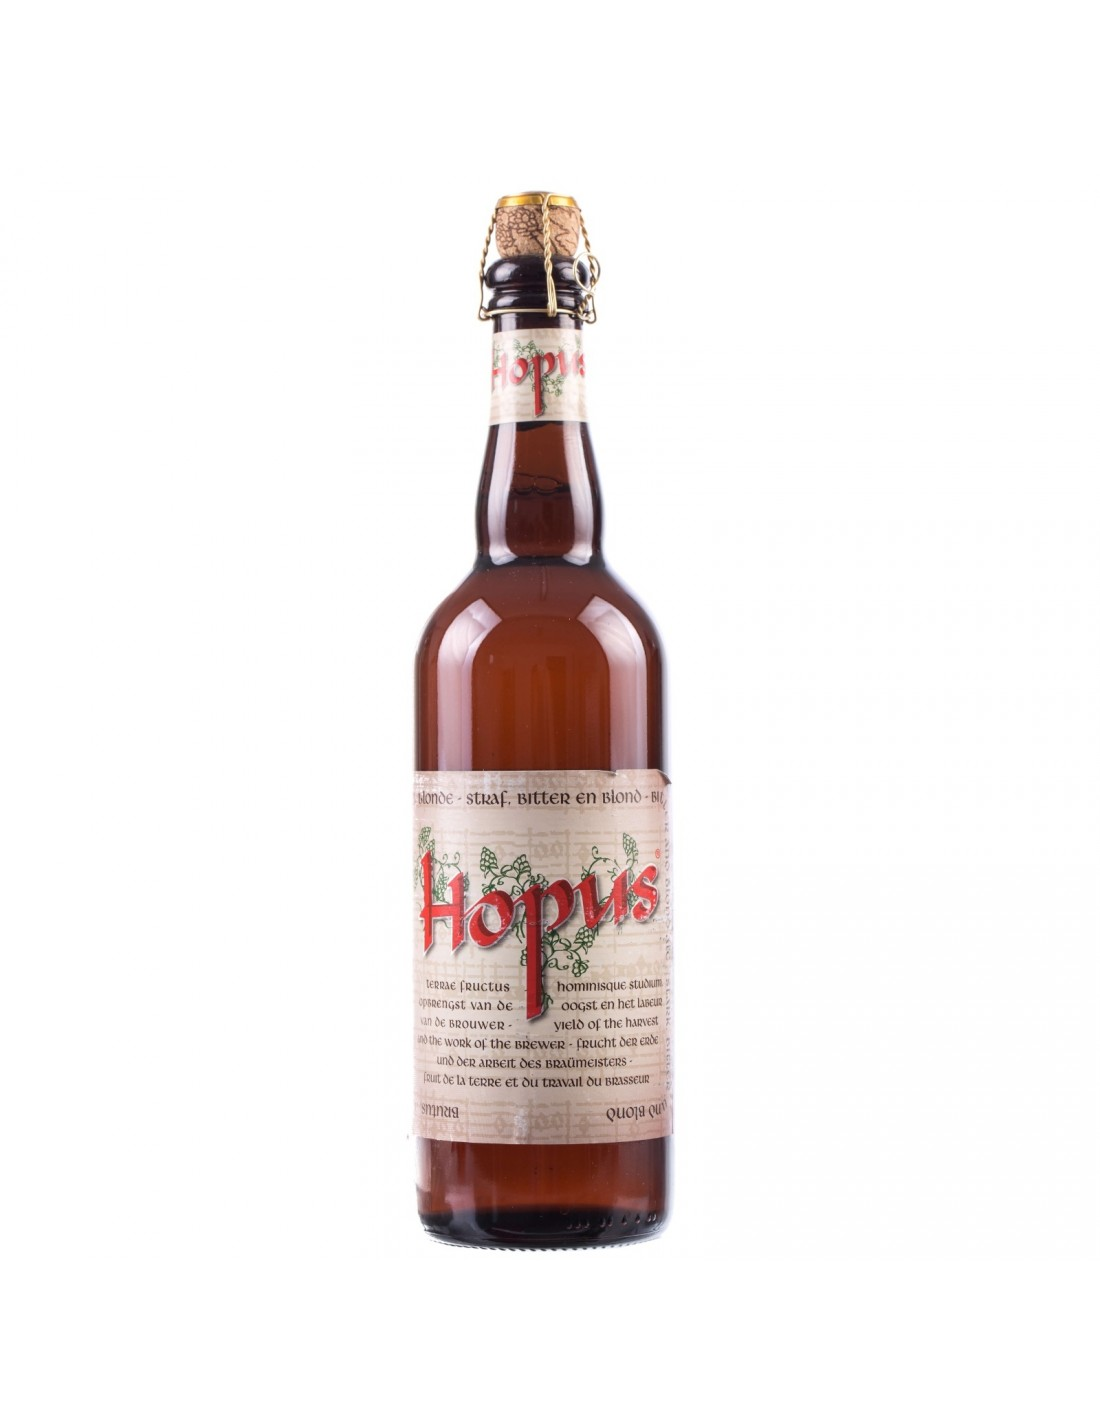 Bere blonda Hopus, 8.3% alc., 0.75L, Belgia